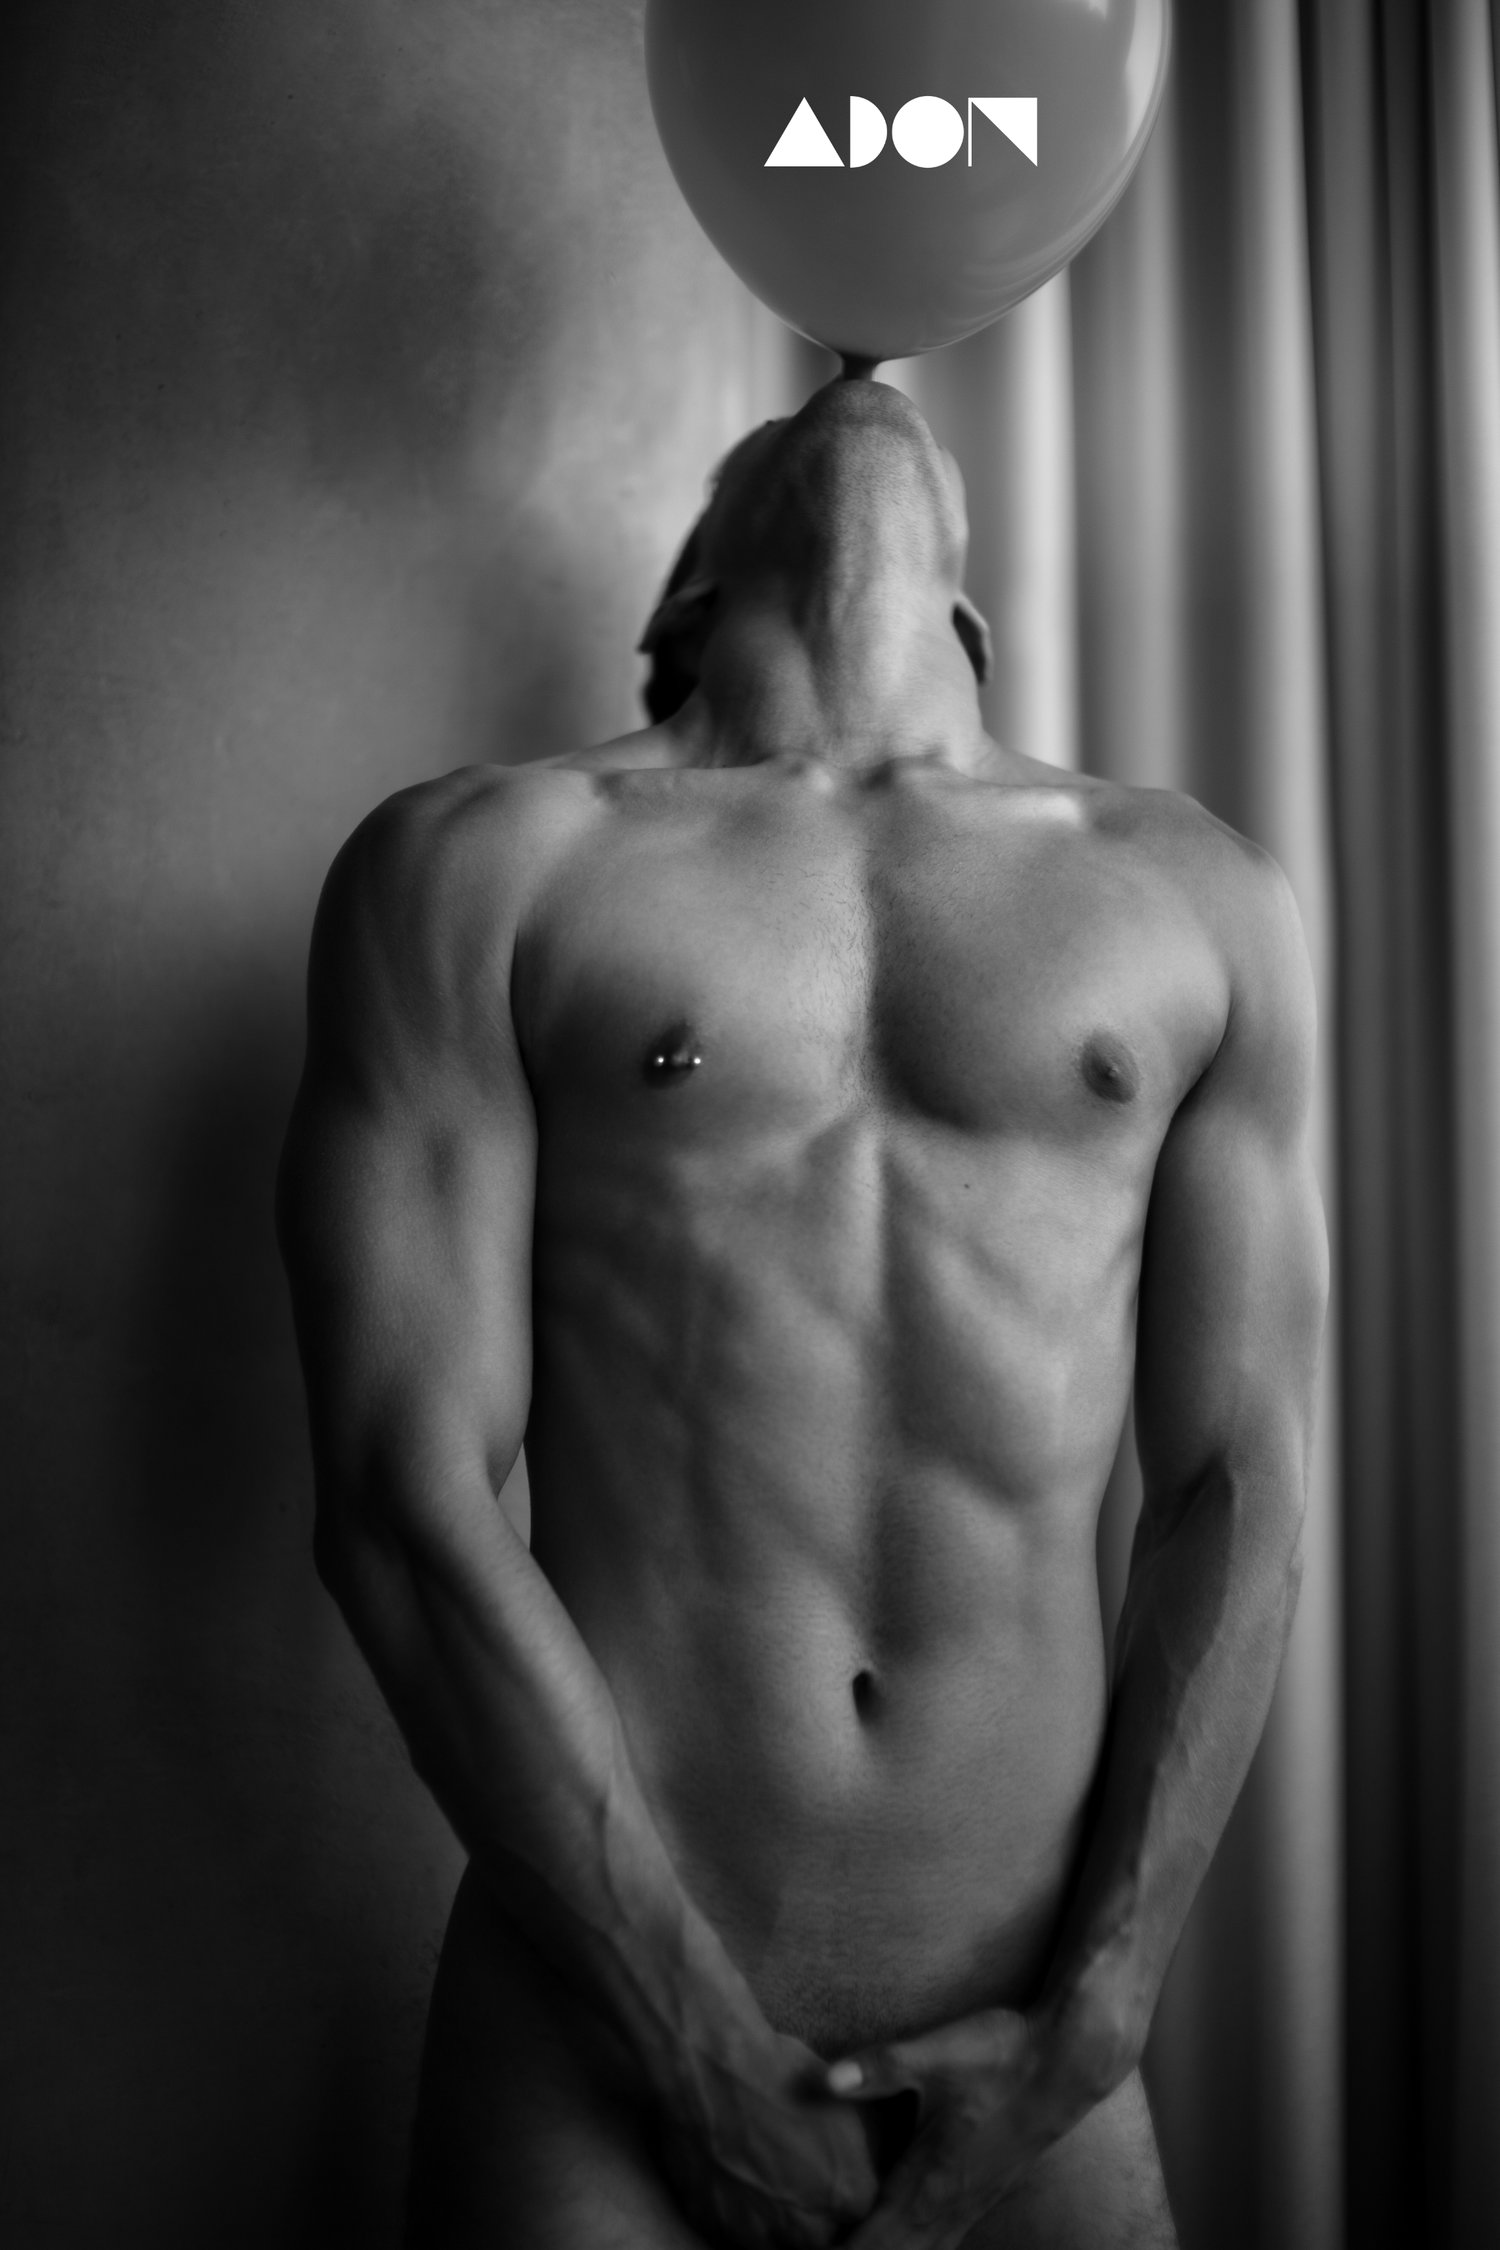 Adon Exclusive: Model JianCarlos Vasquez By Craig Macleod